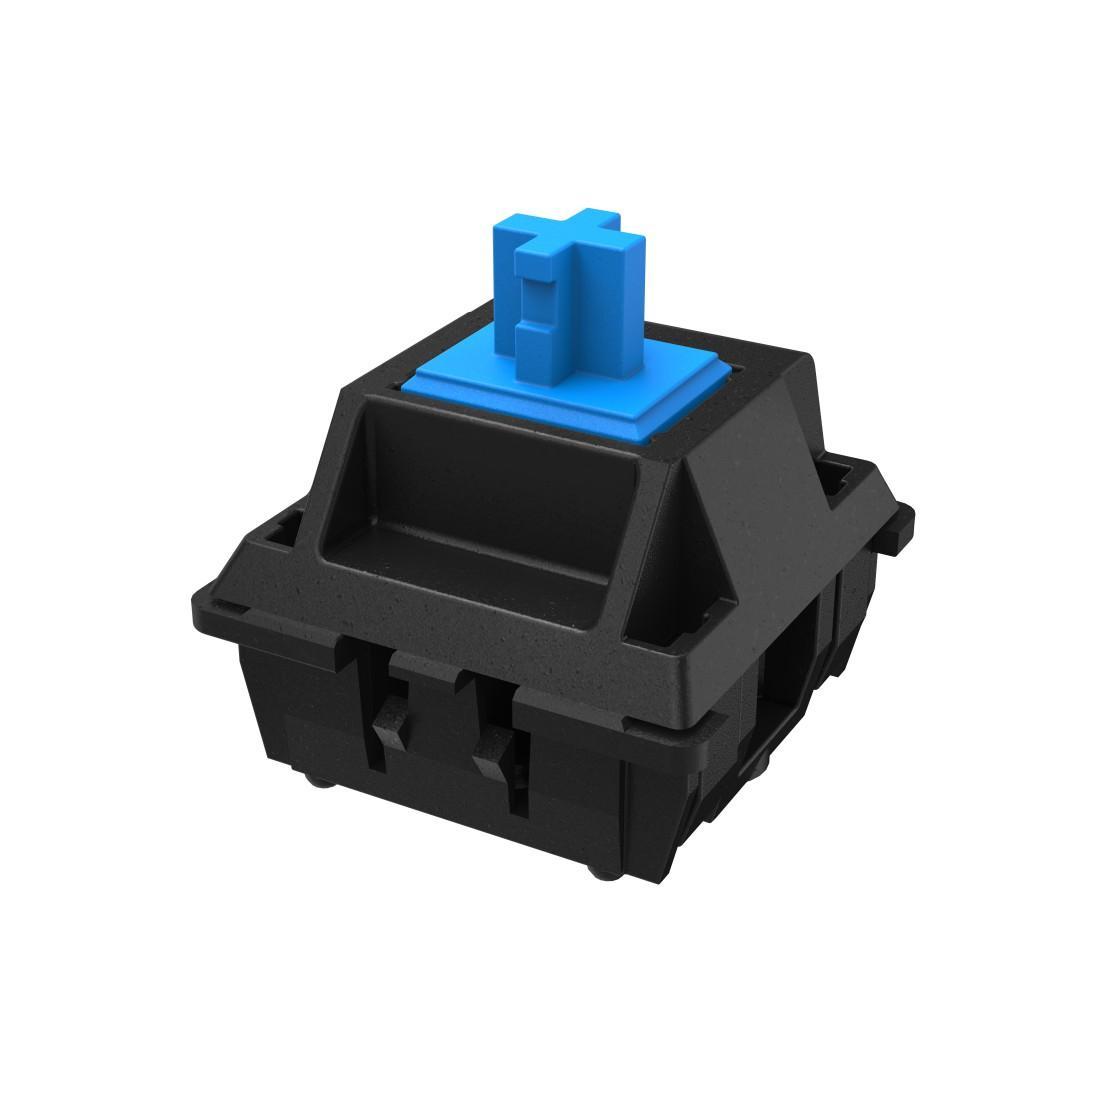 Геймърска механична клавиатура Hama, uRage Exodus 800, Blue switch-3